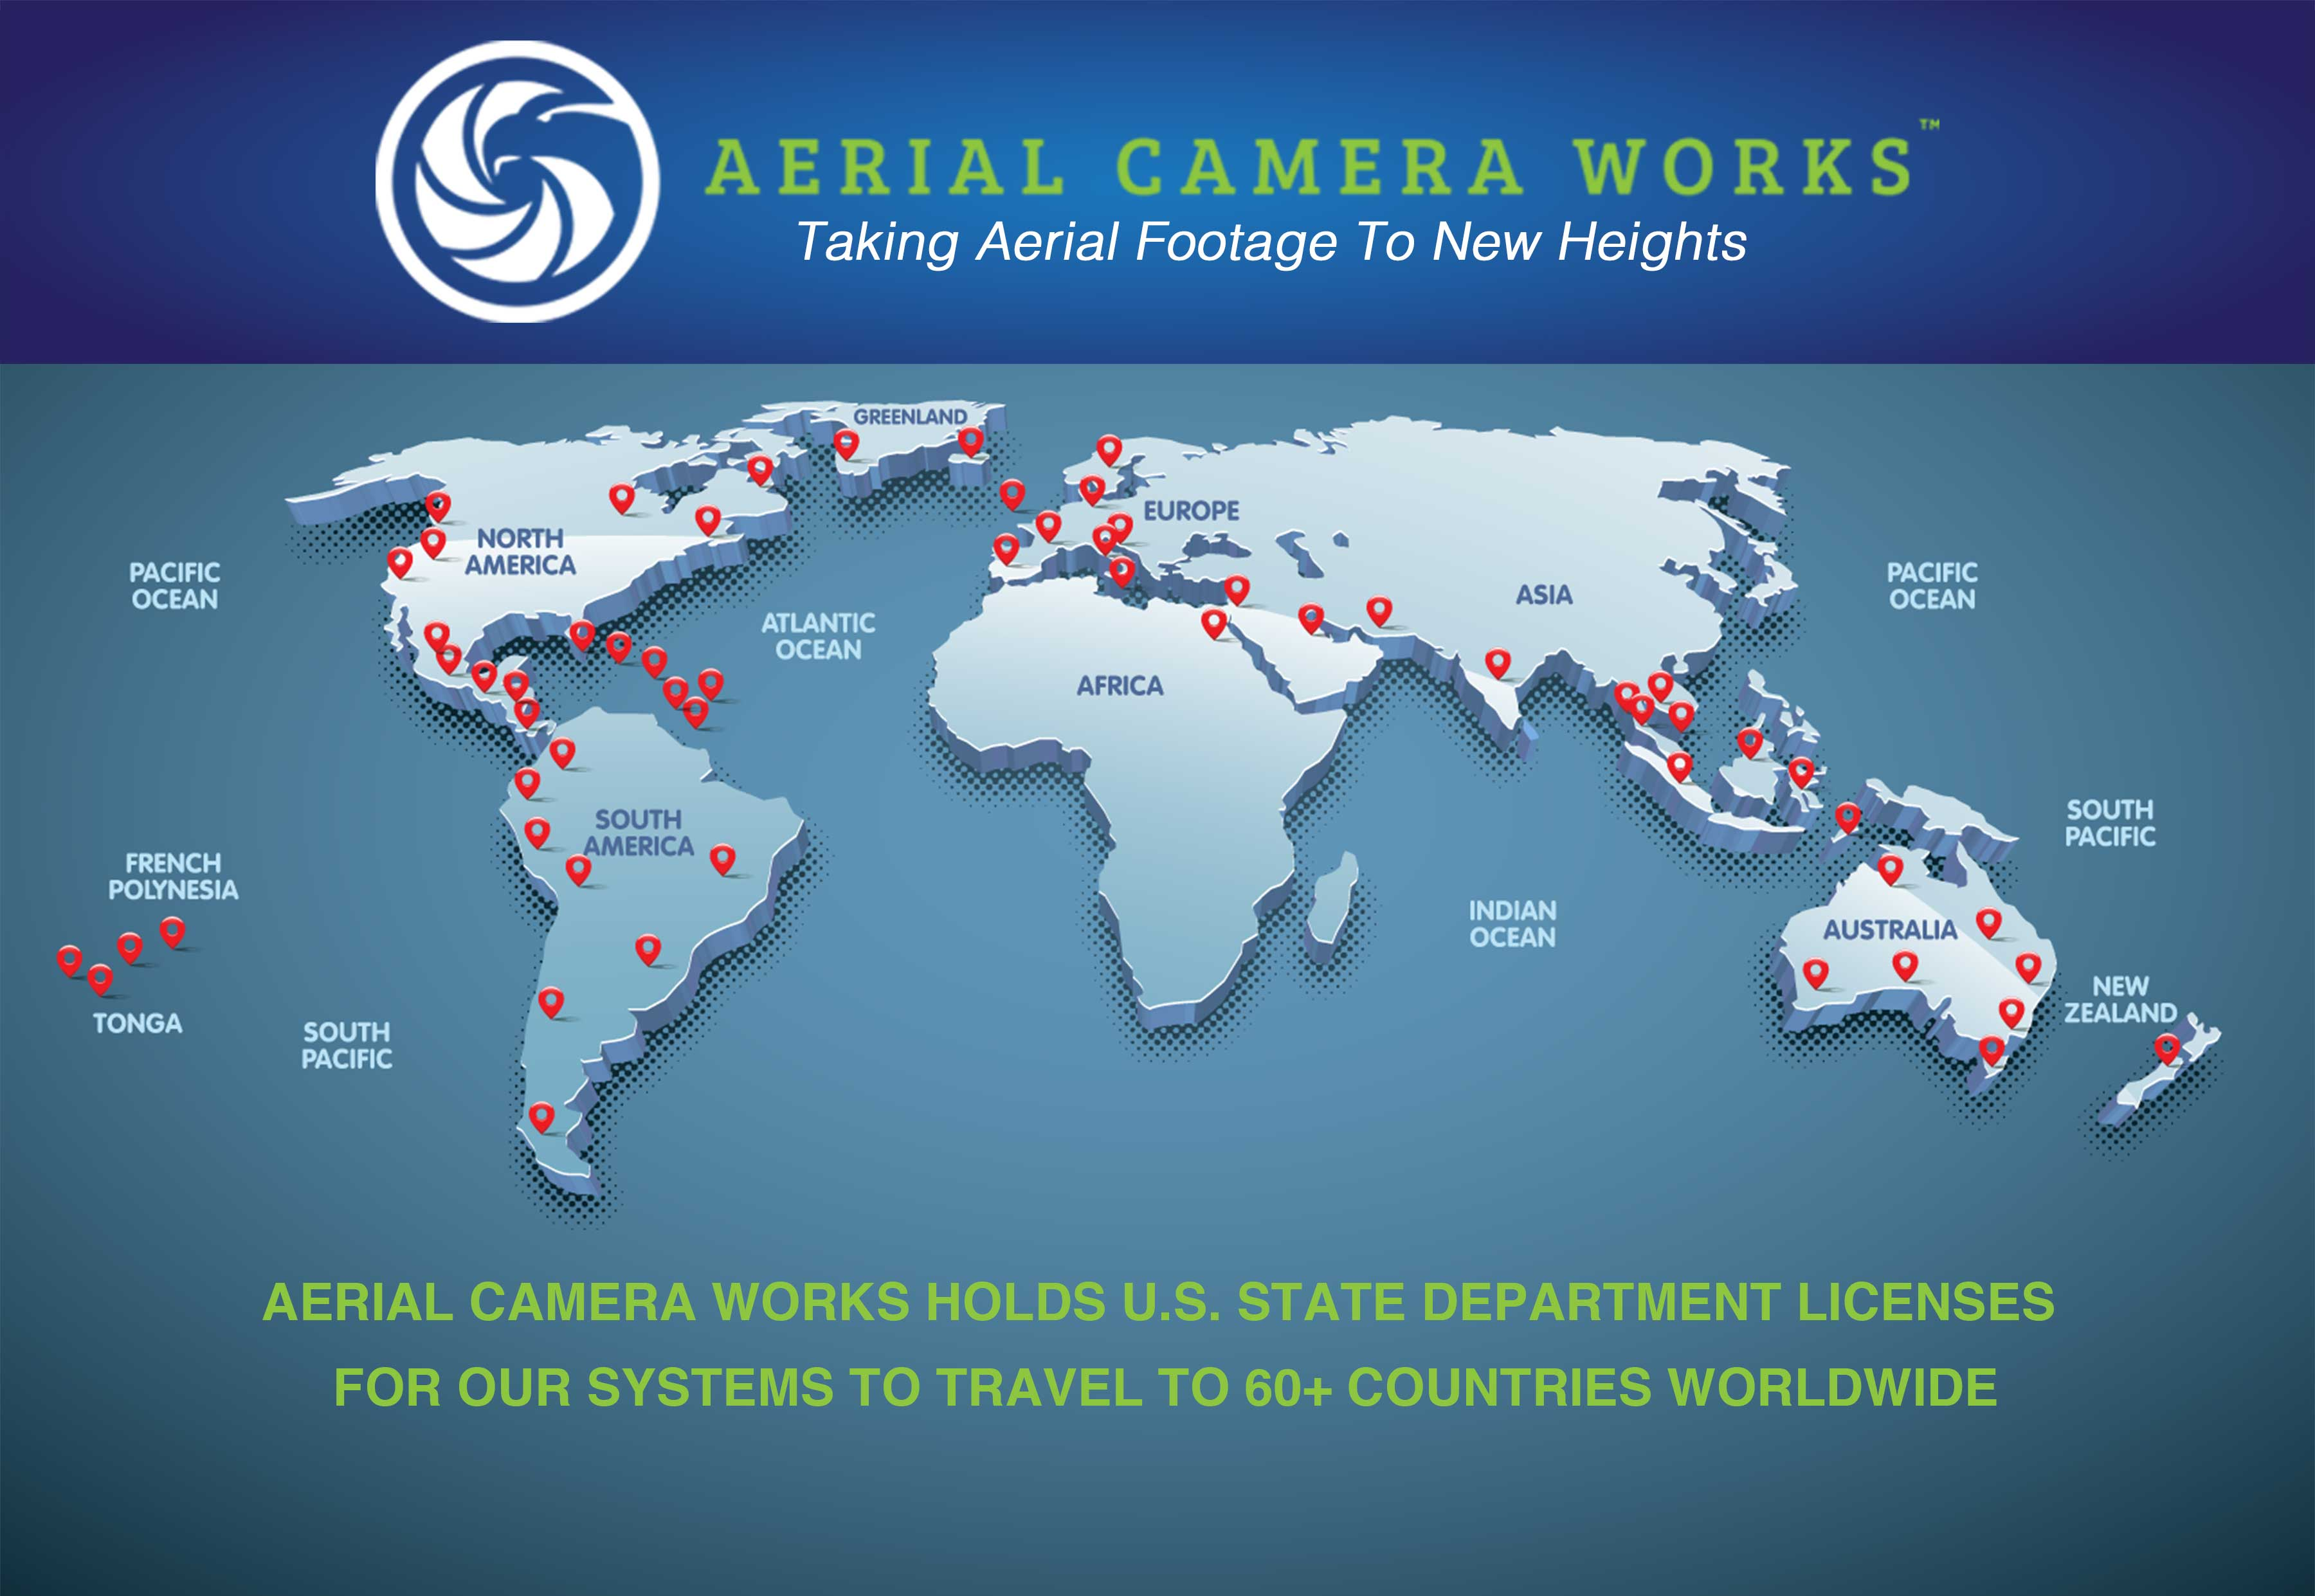 Aerial Camera Works Licensed in 60 Countries